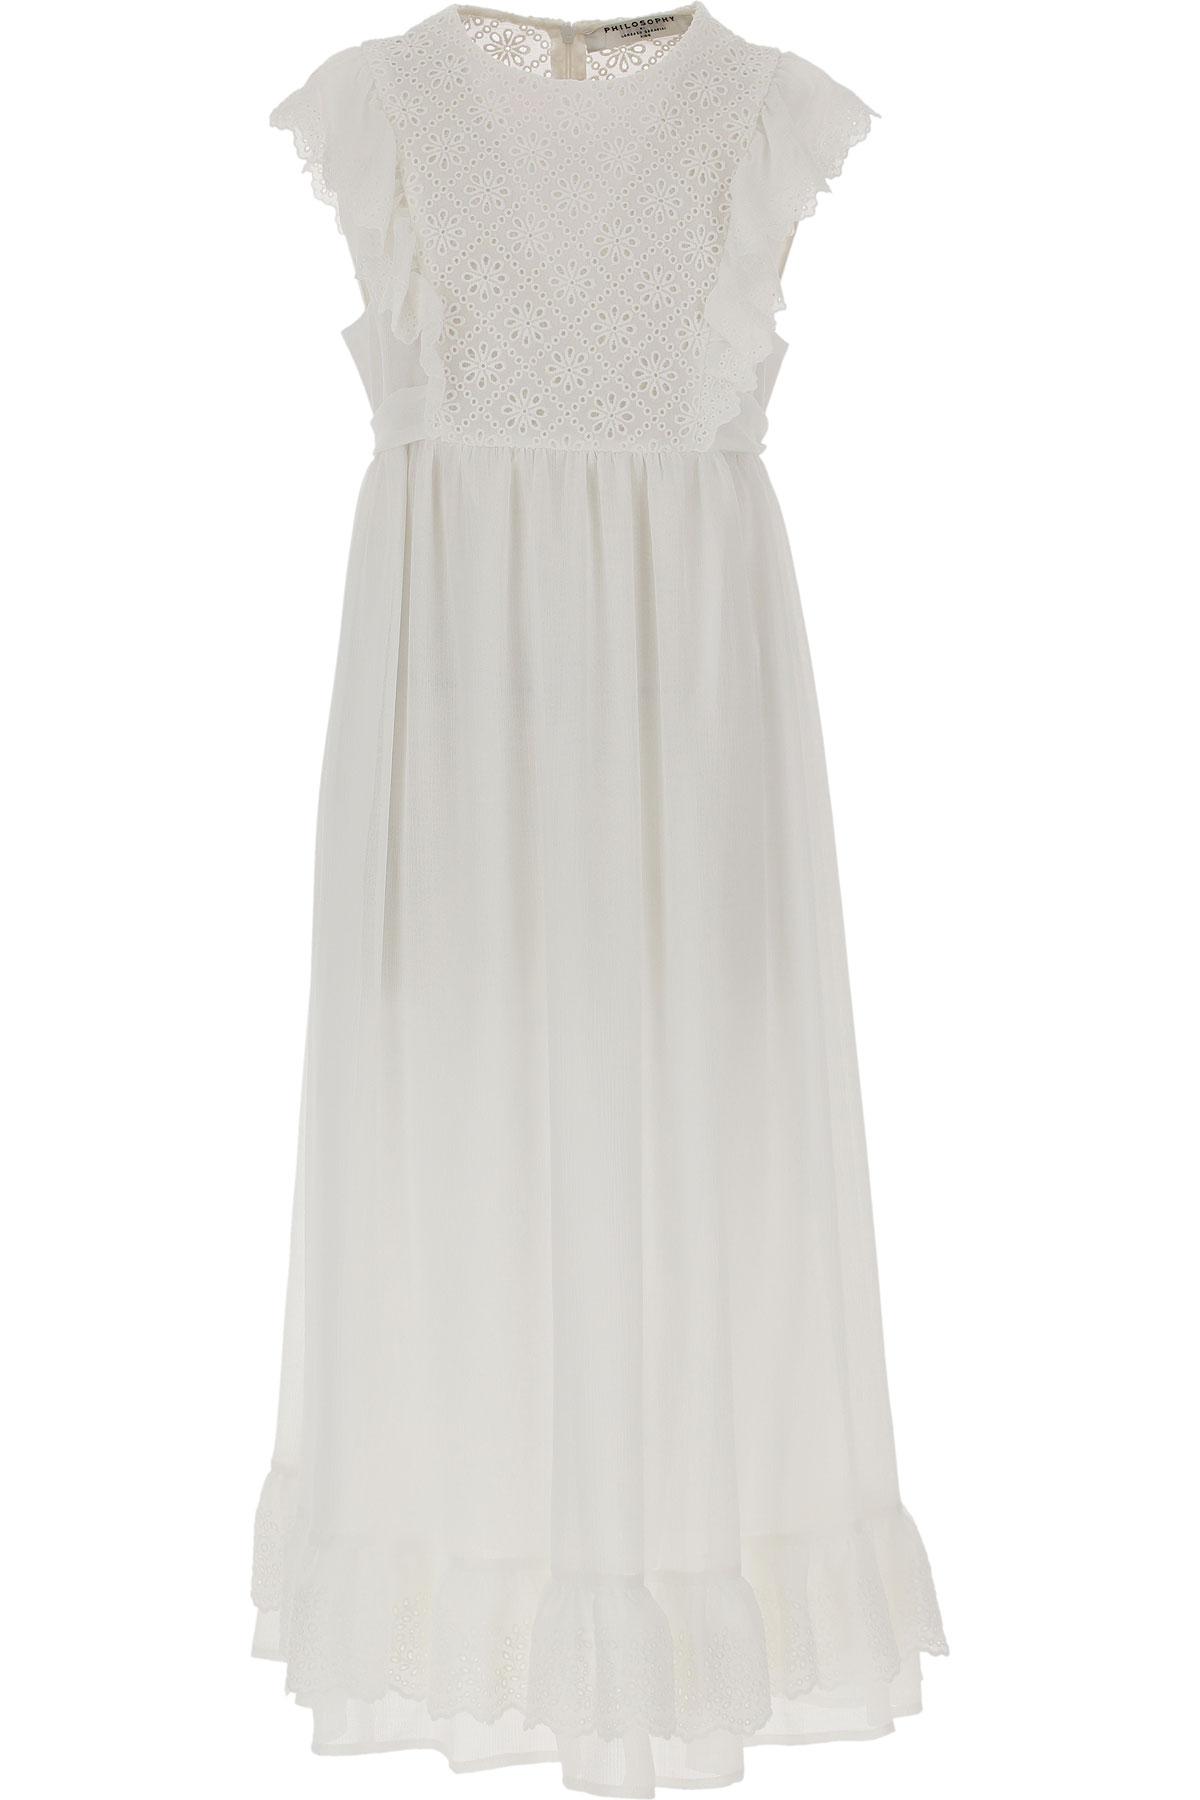 Philosophy di Lorenzo Serafini Girls Dress On Sale, White, polyester, 2019, L M XL